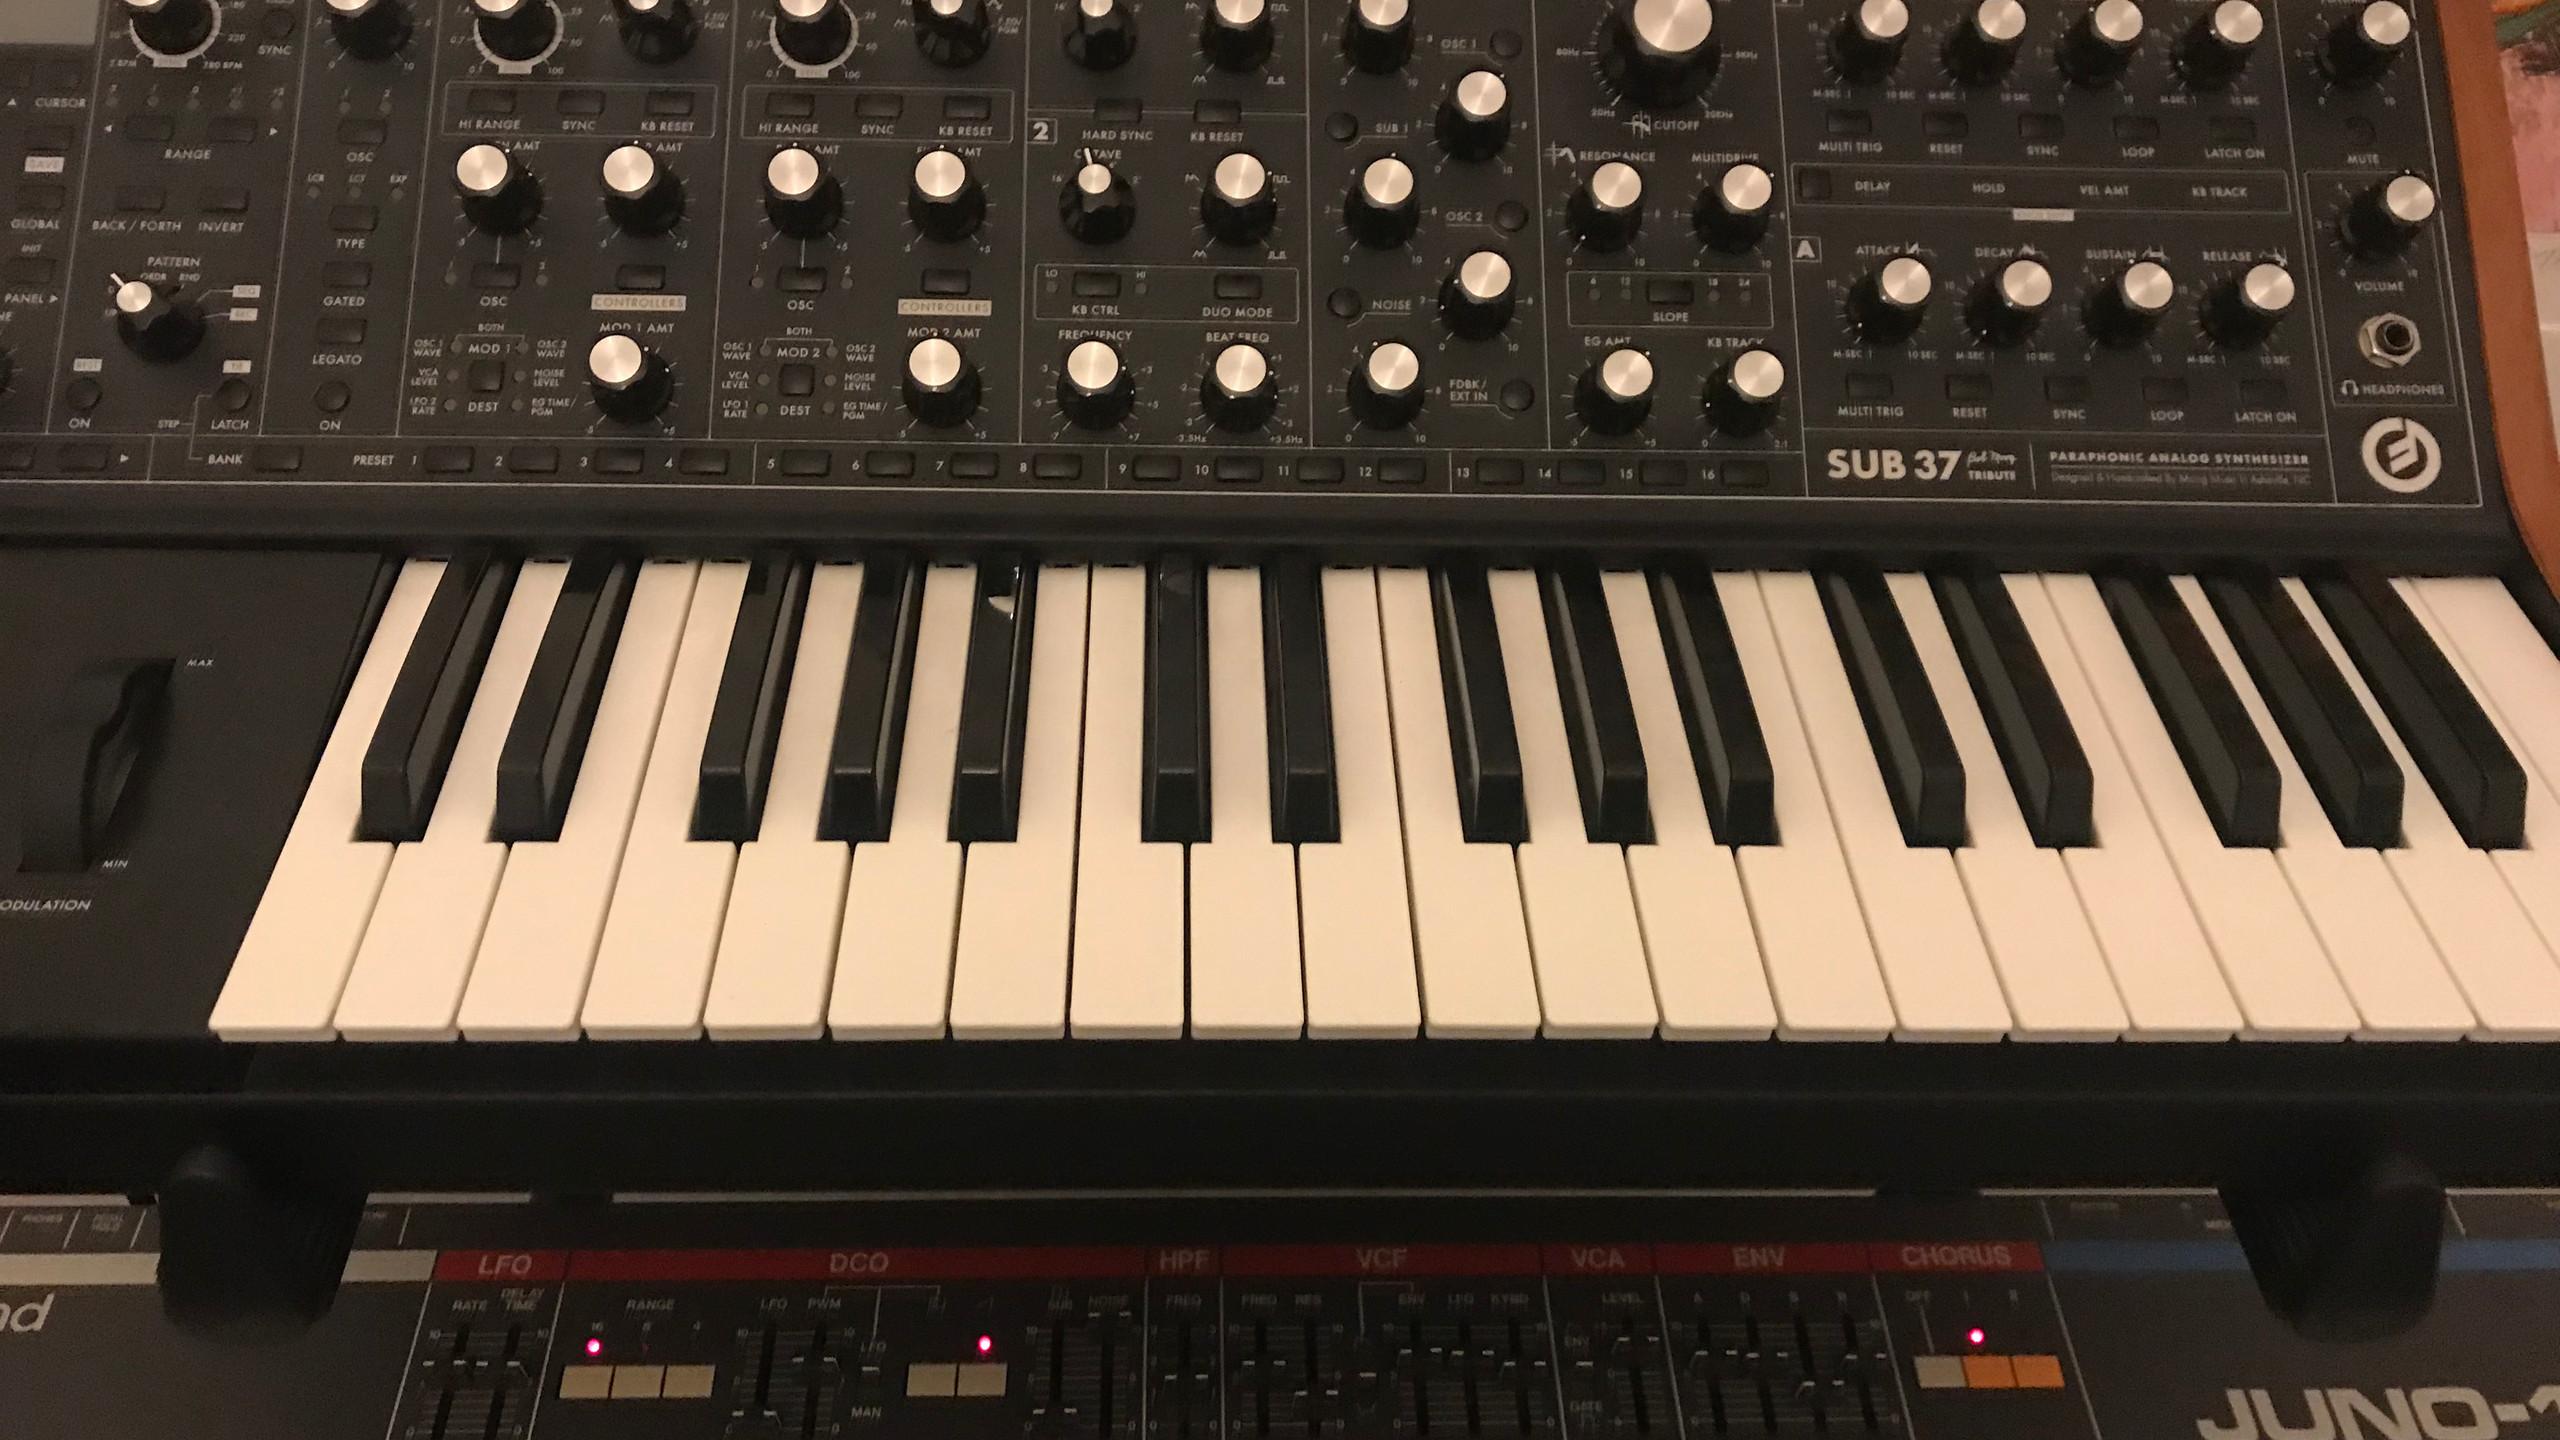 The Moog Sub 37